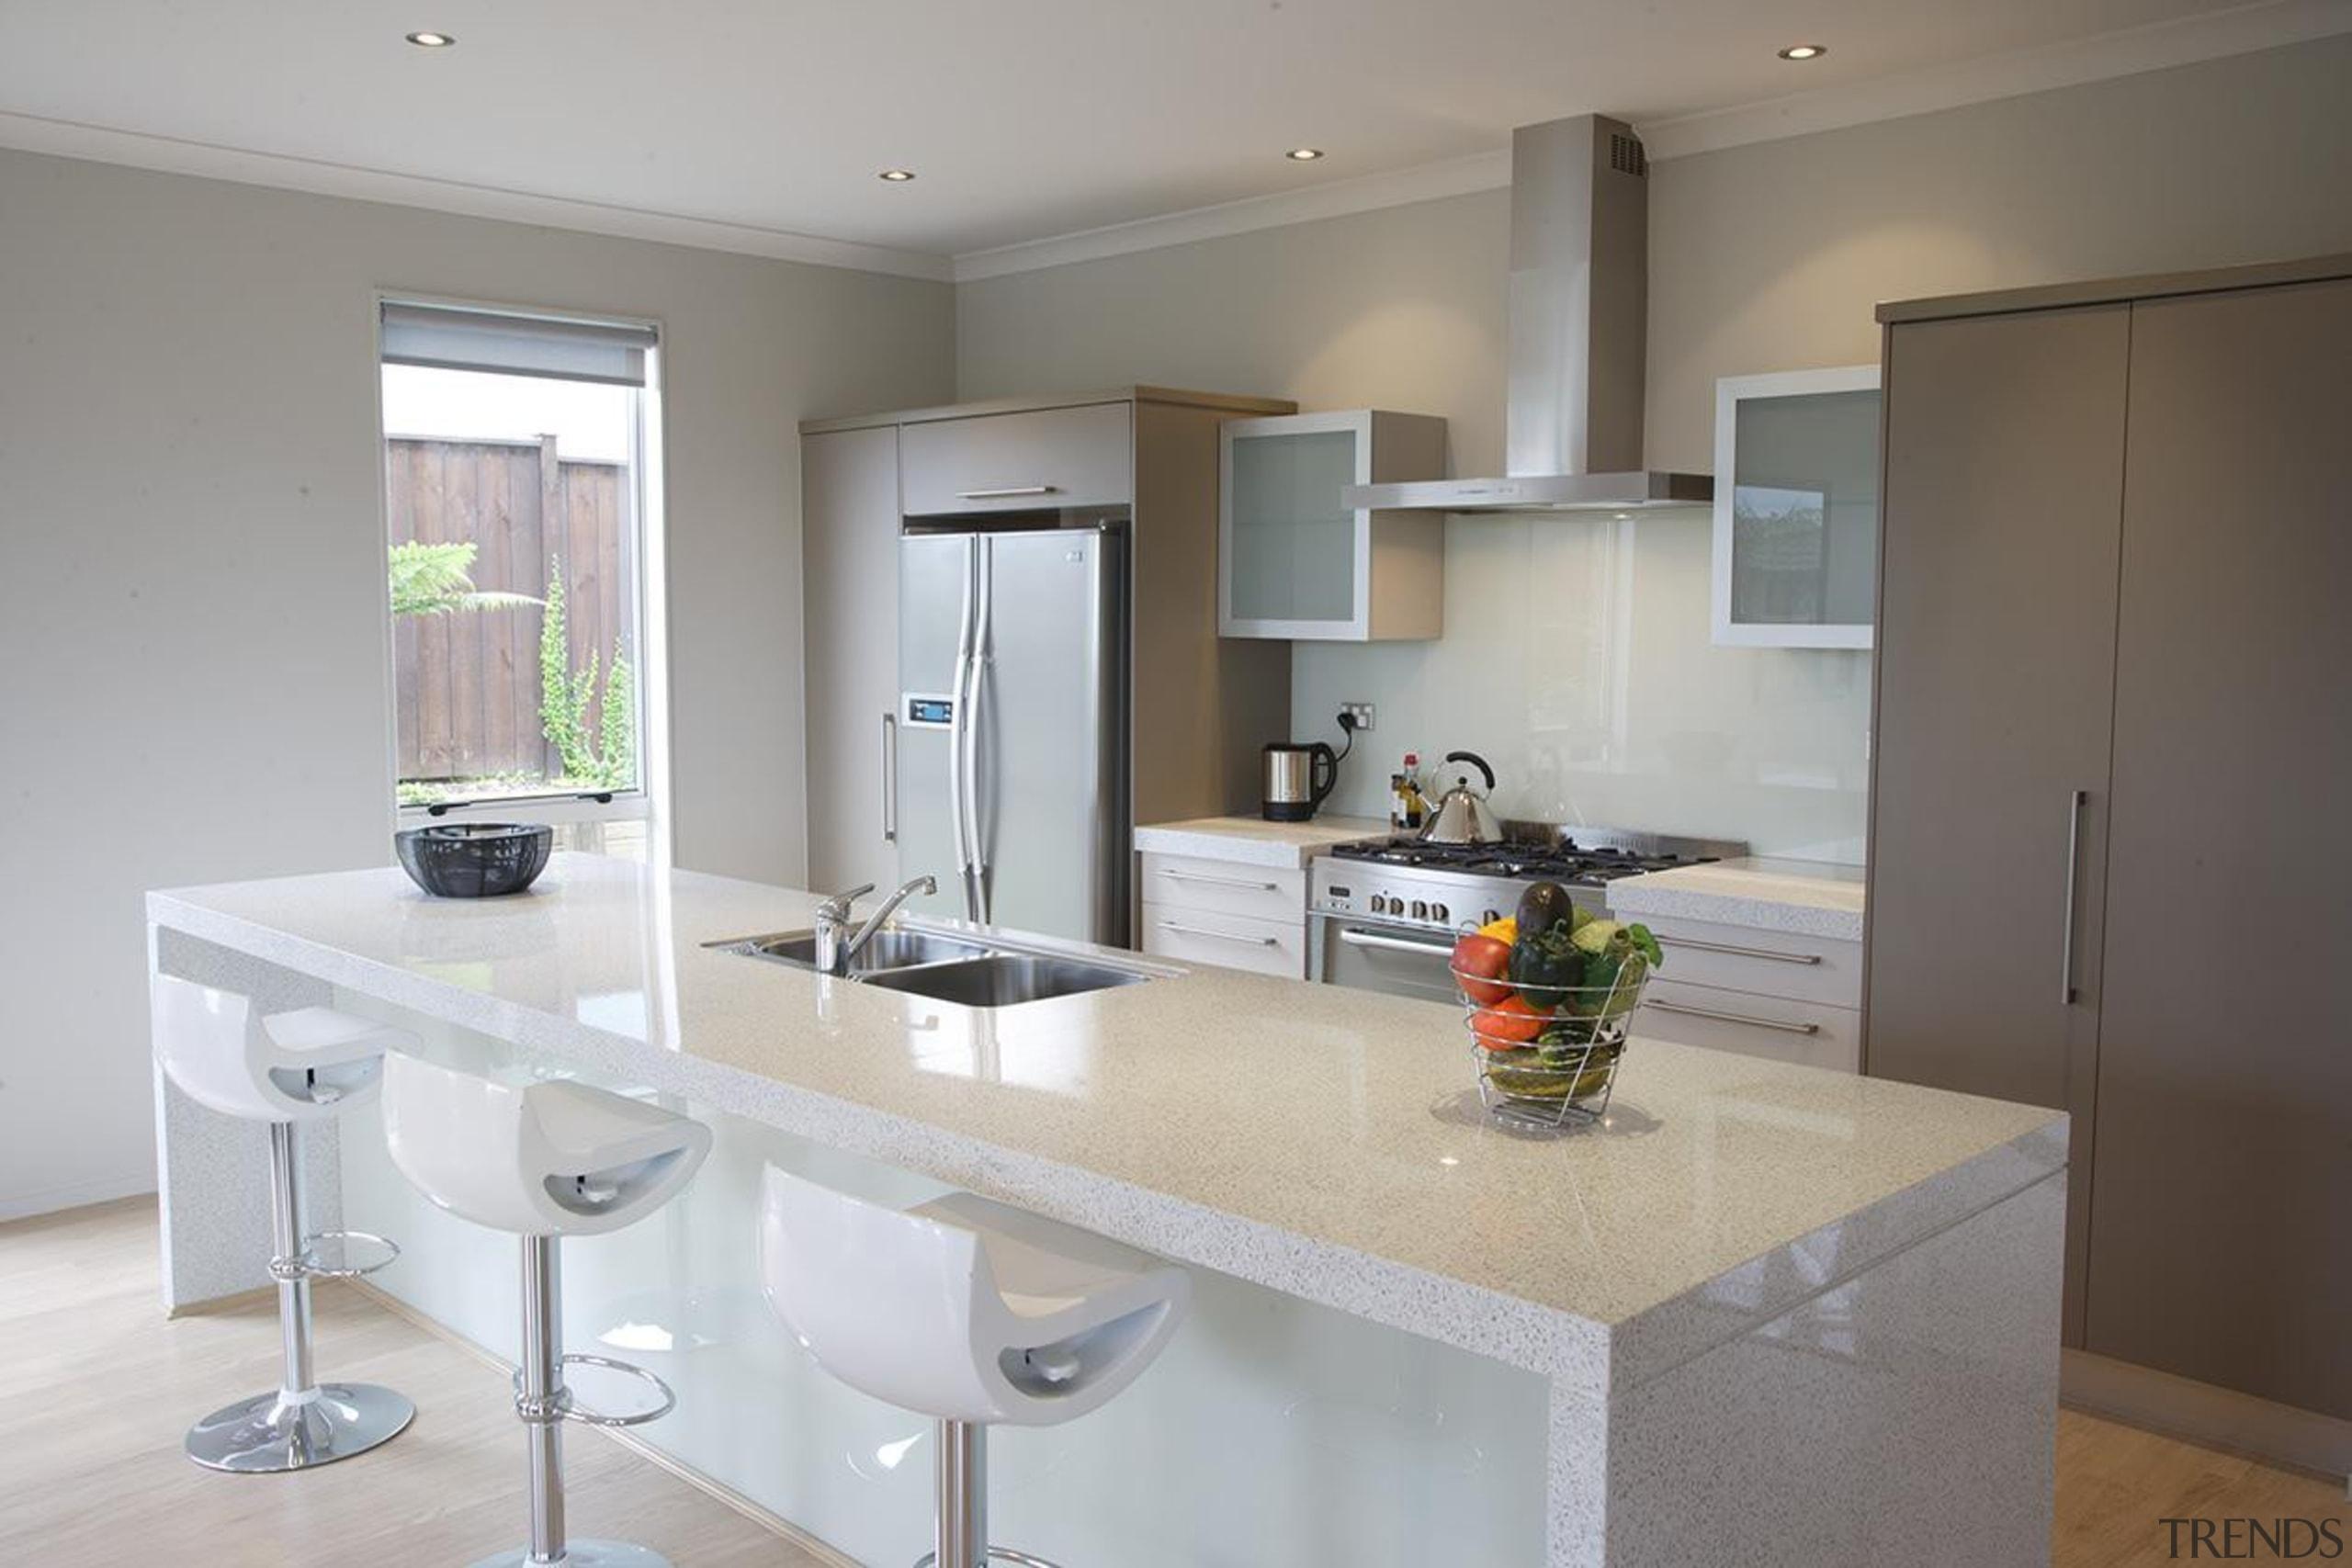 For more information, please visit www.gjgardner.co.nz countertop, cuisine classique, interior design, kitchen, real estate, room, gray